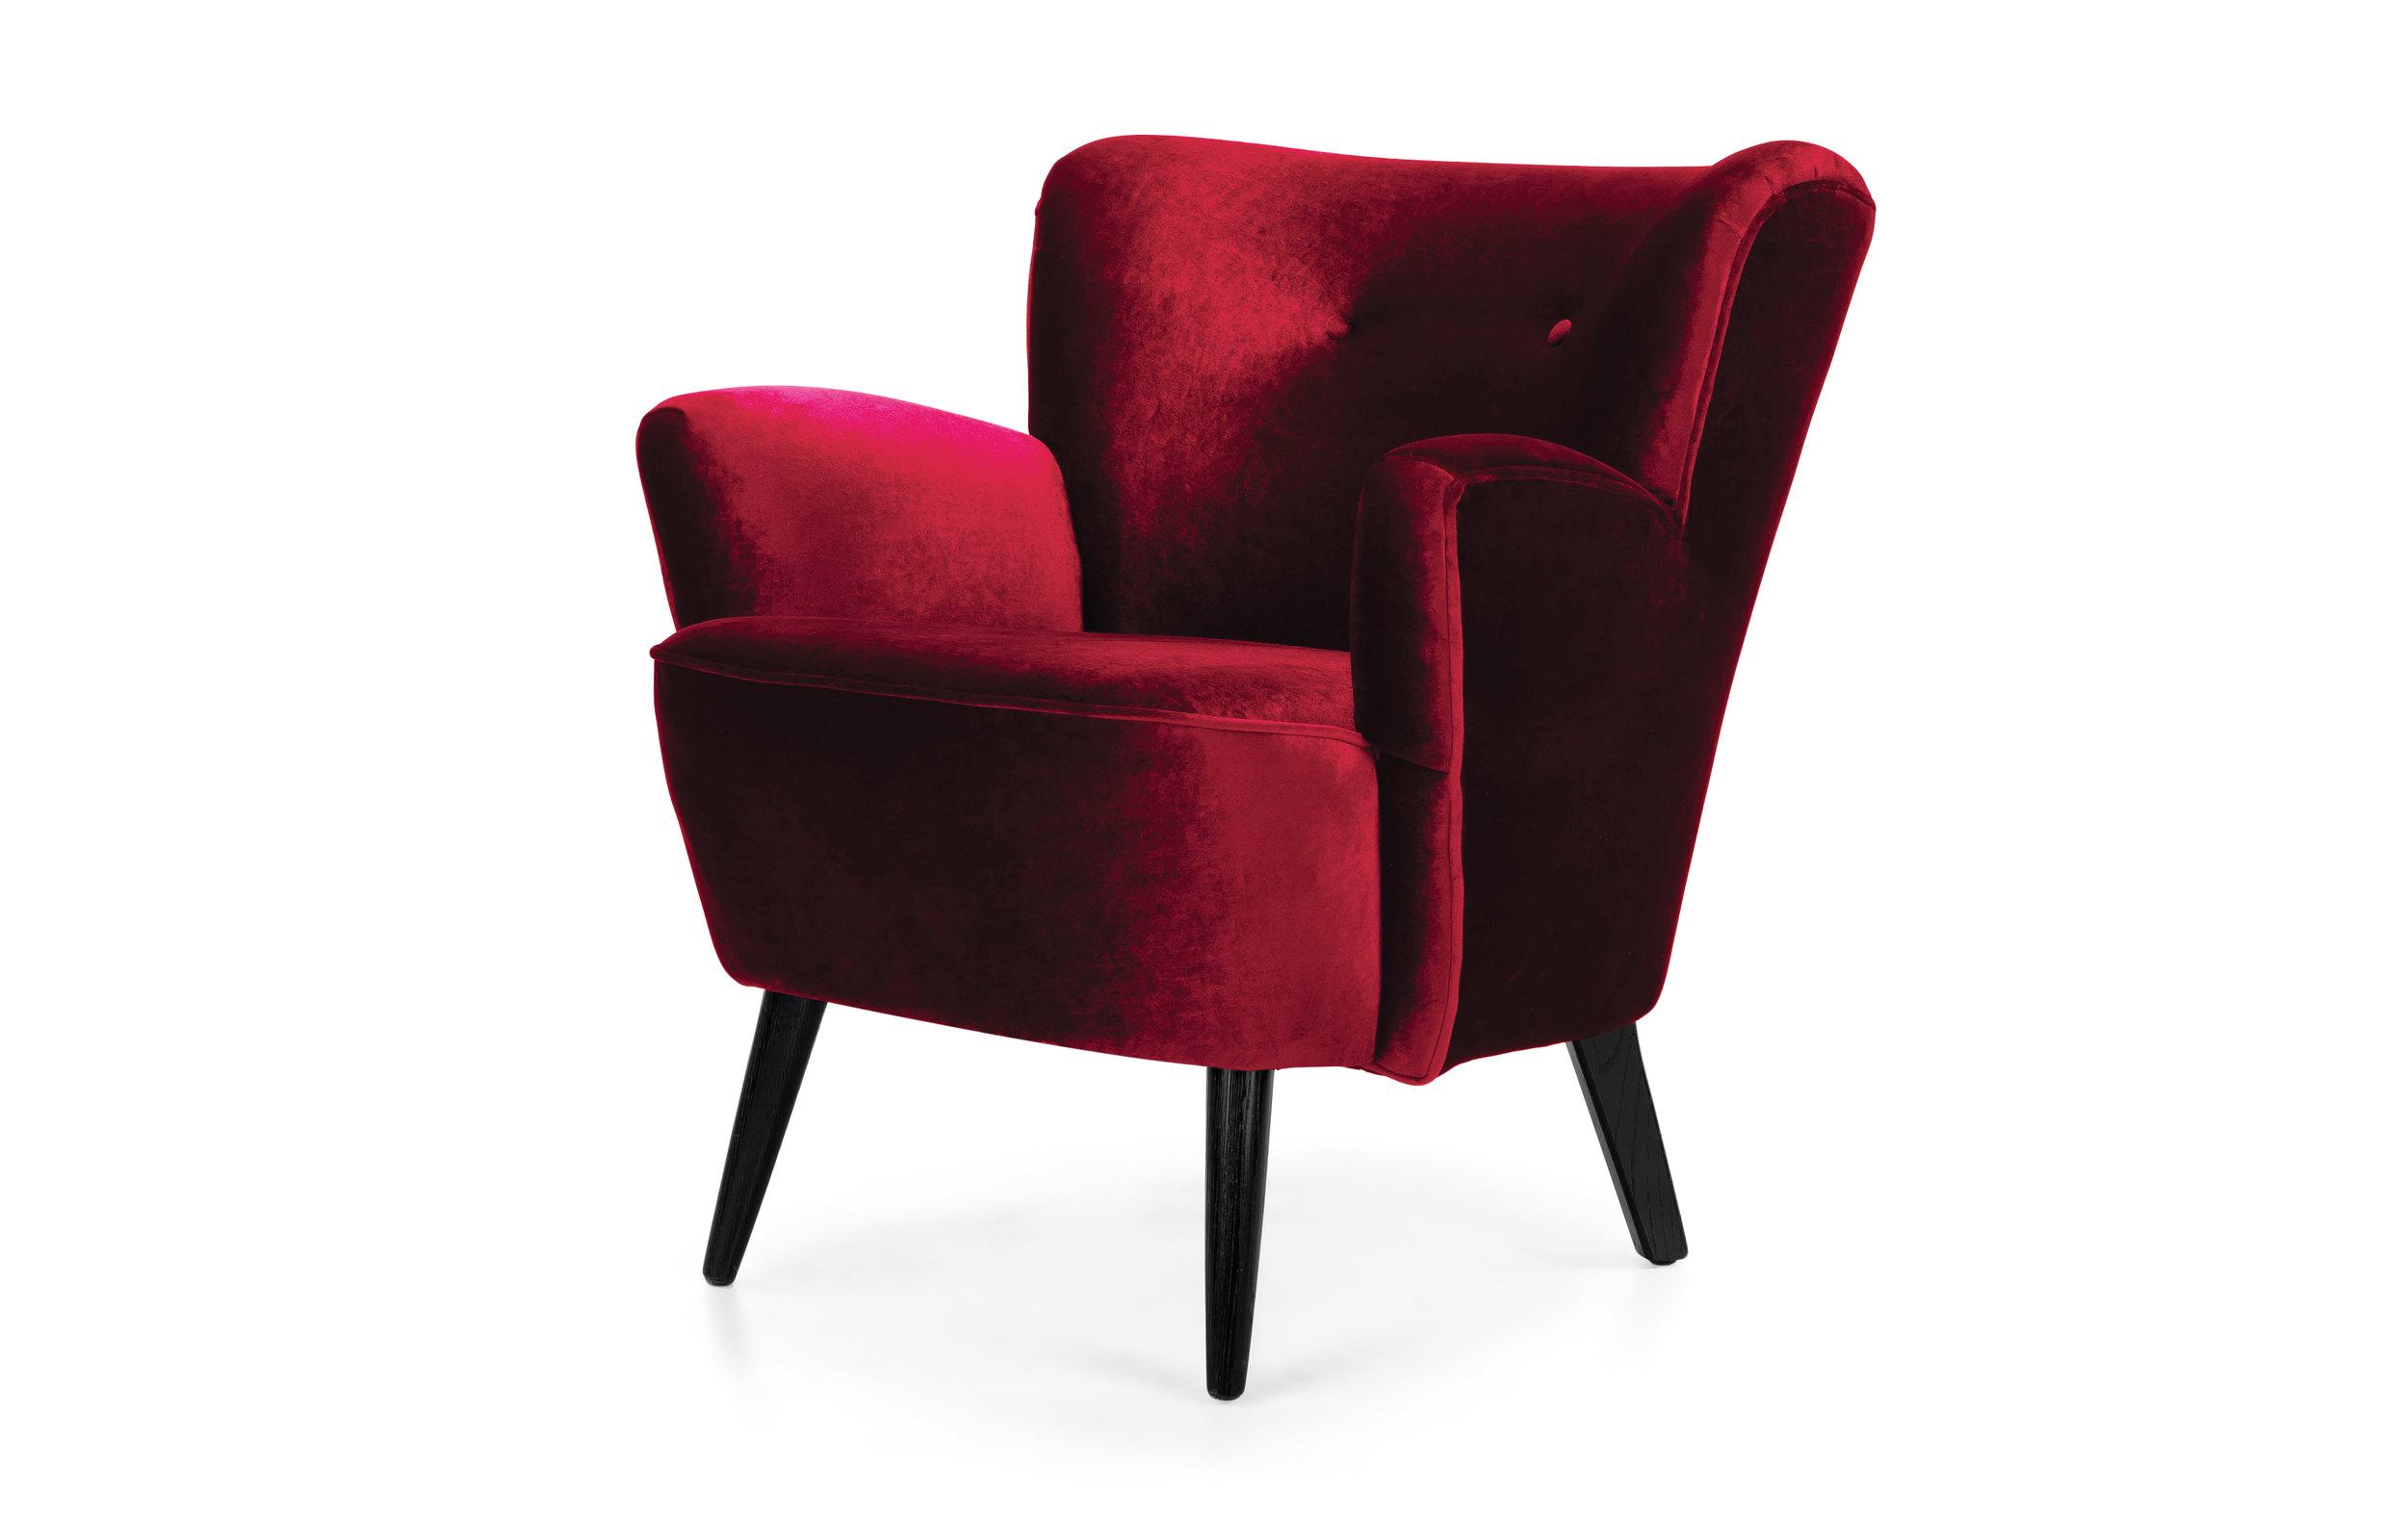 http://www.made.com/lotus-armchair-crimson-red